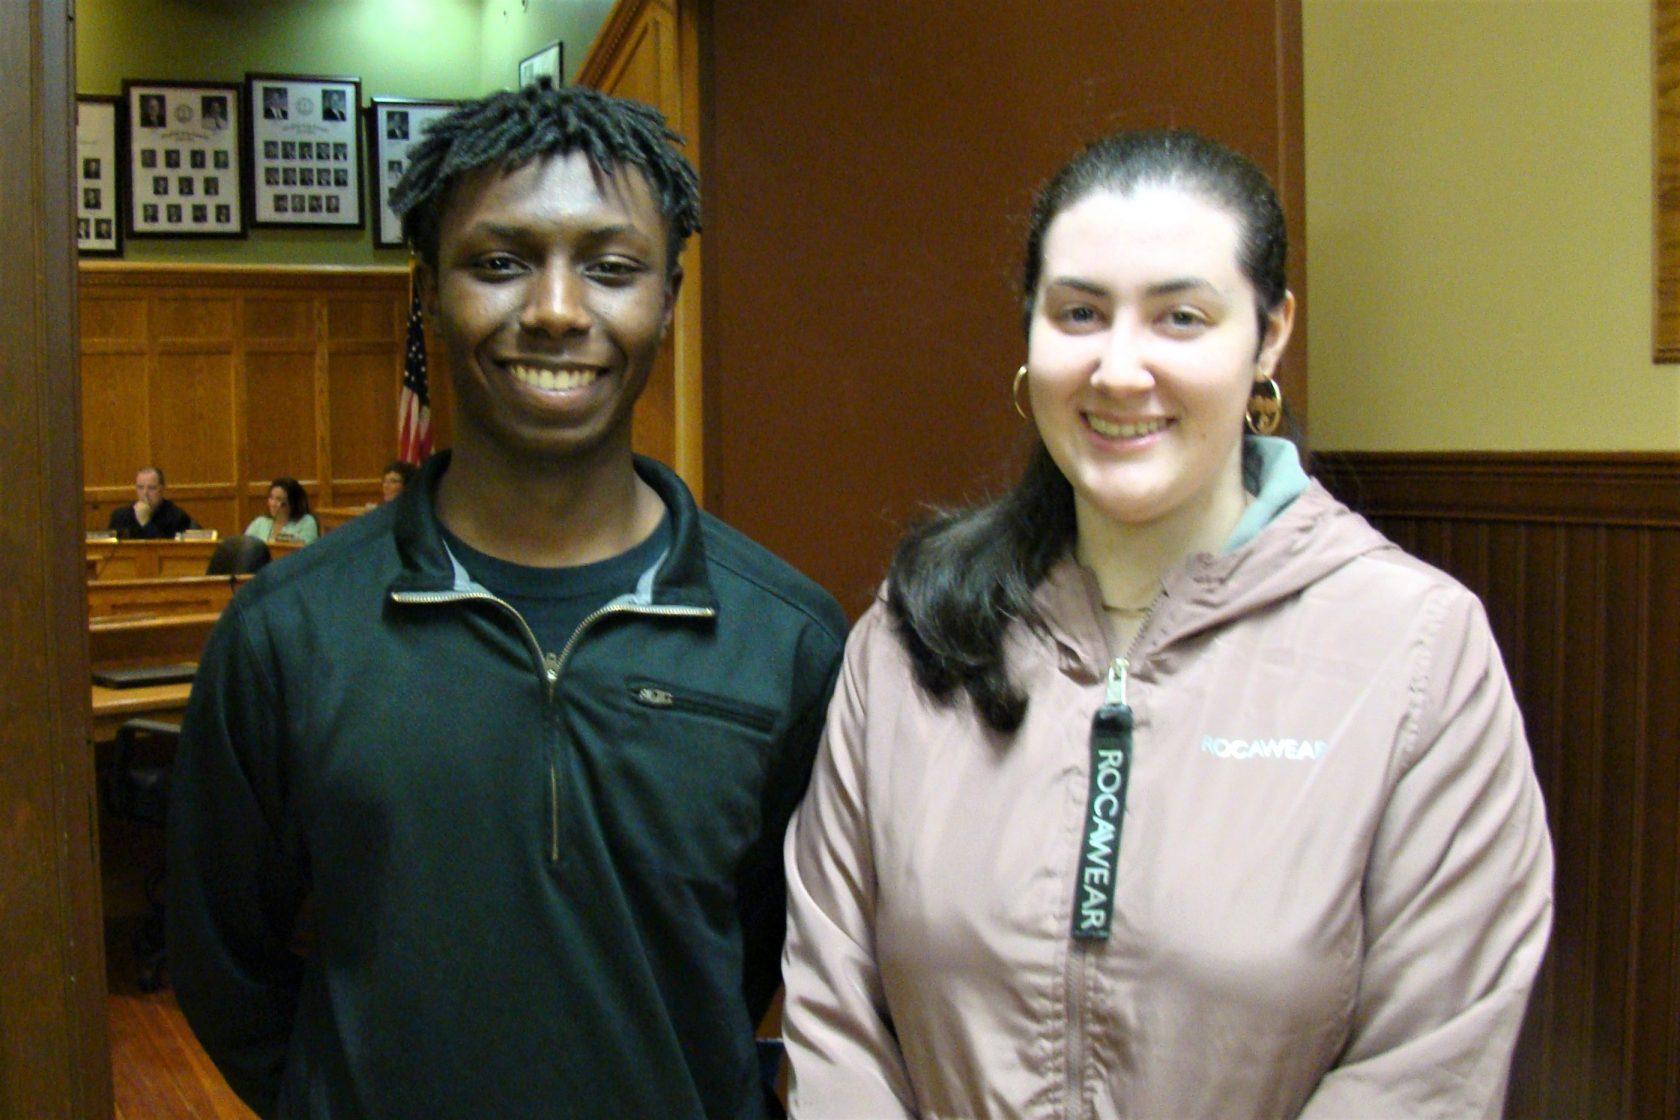 WTA student liaisons Alex Blake and Nayelley Ruiz